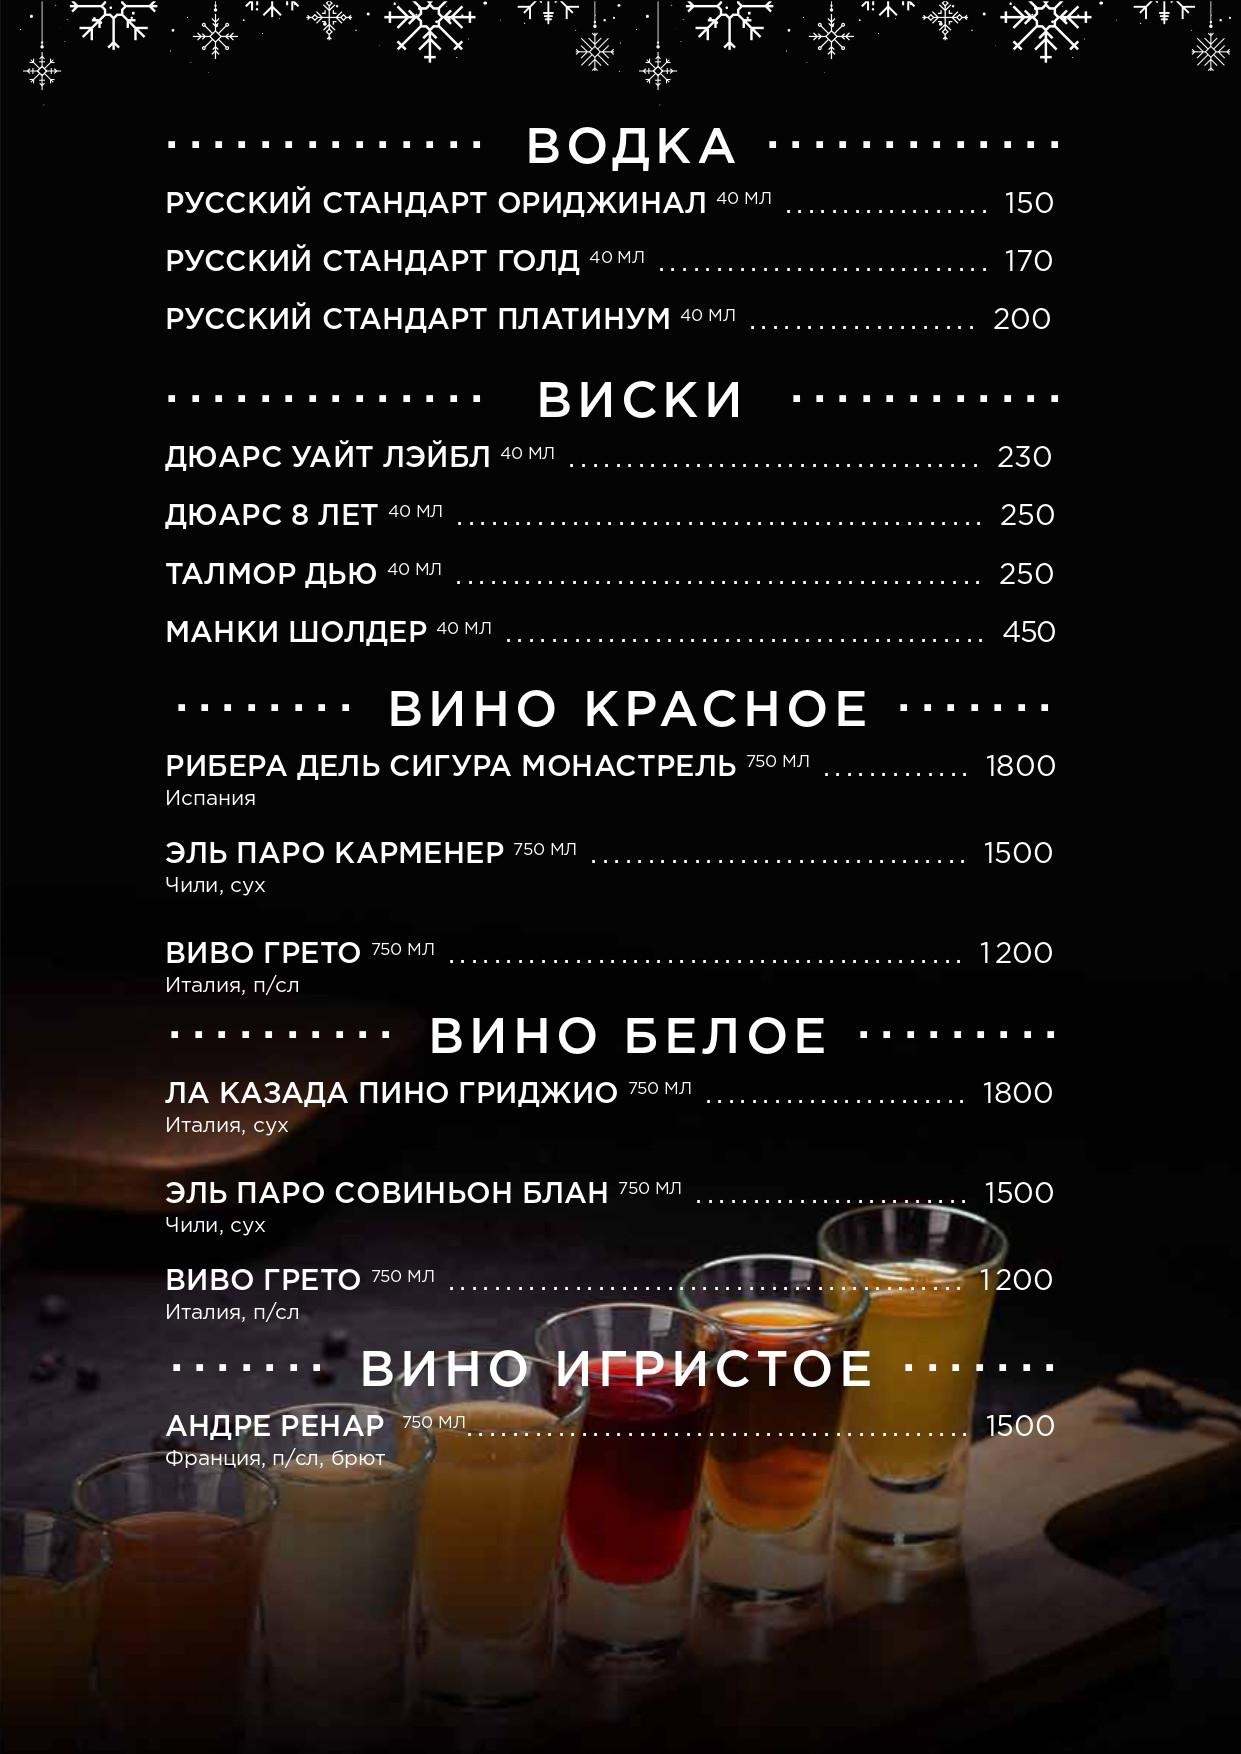 gastroli_menu_ny_2021_1превью_page-0007.